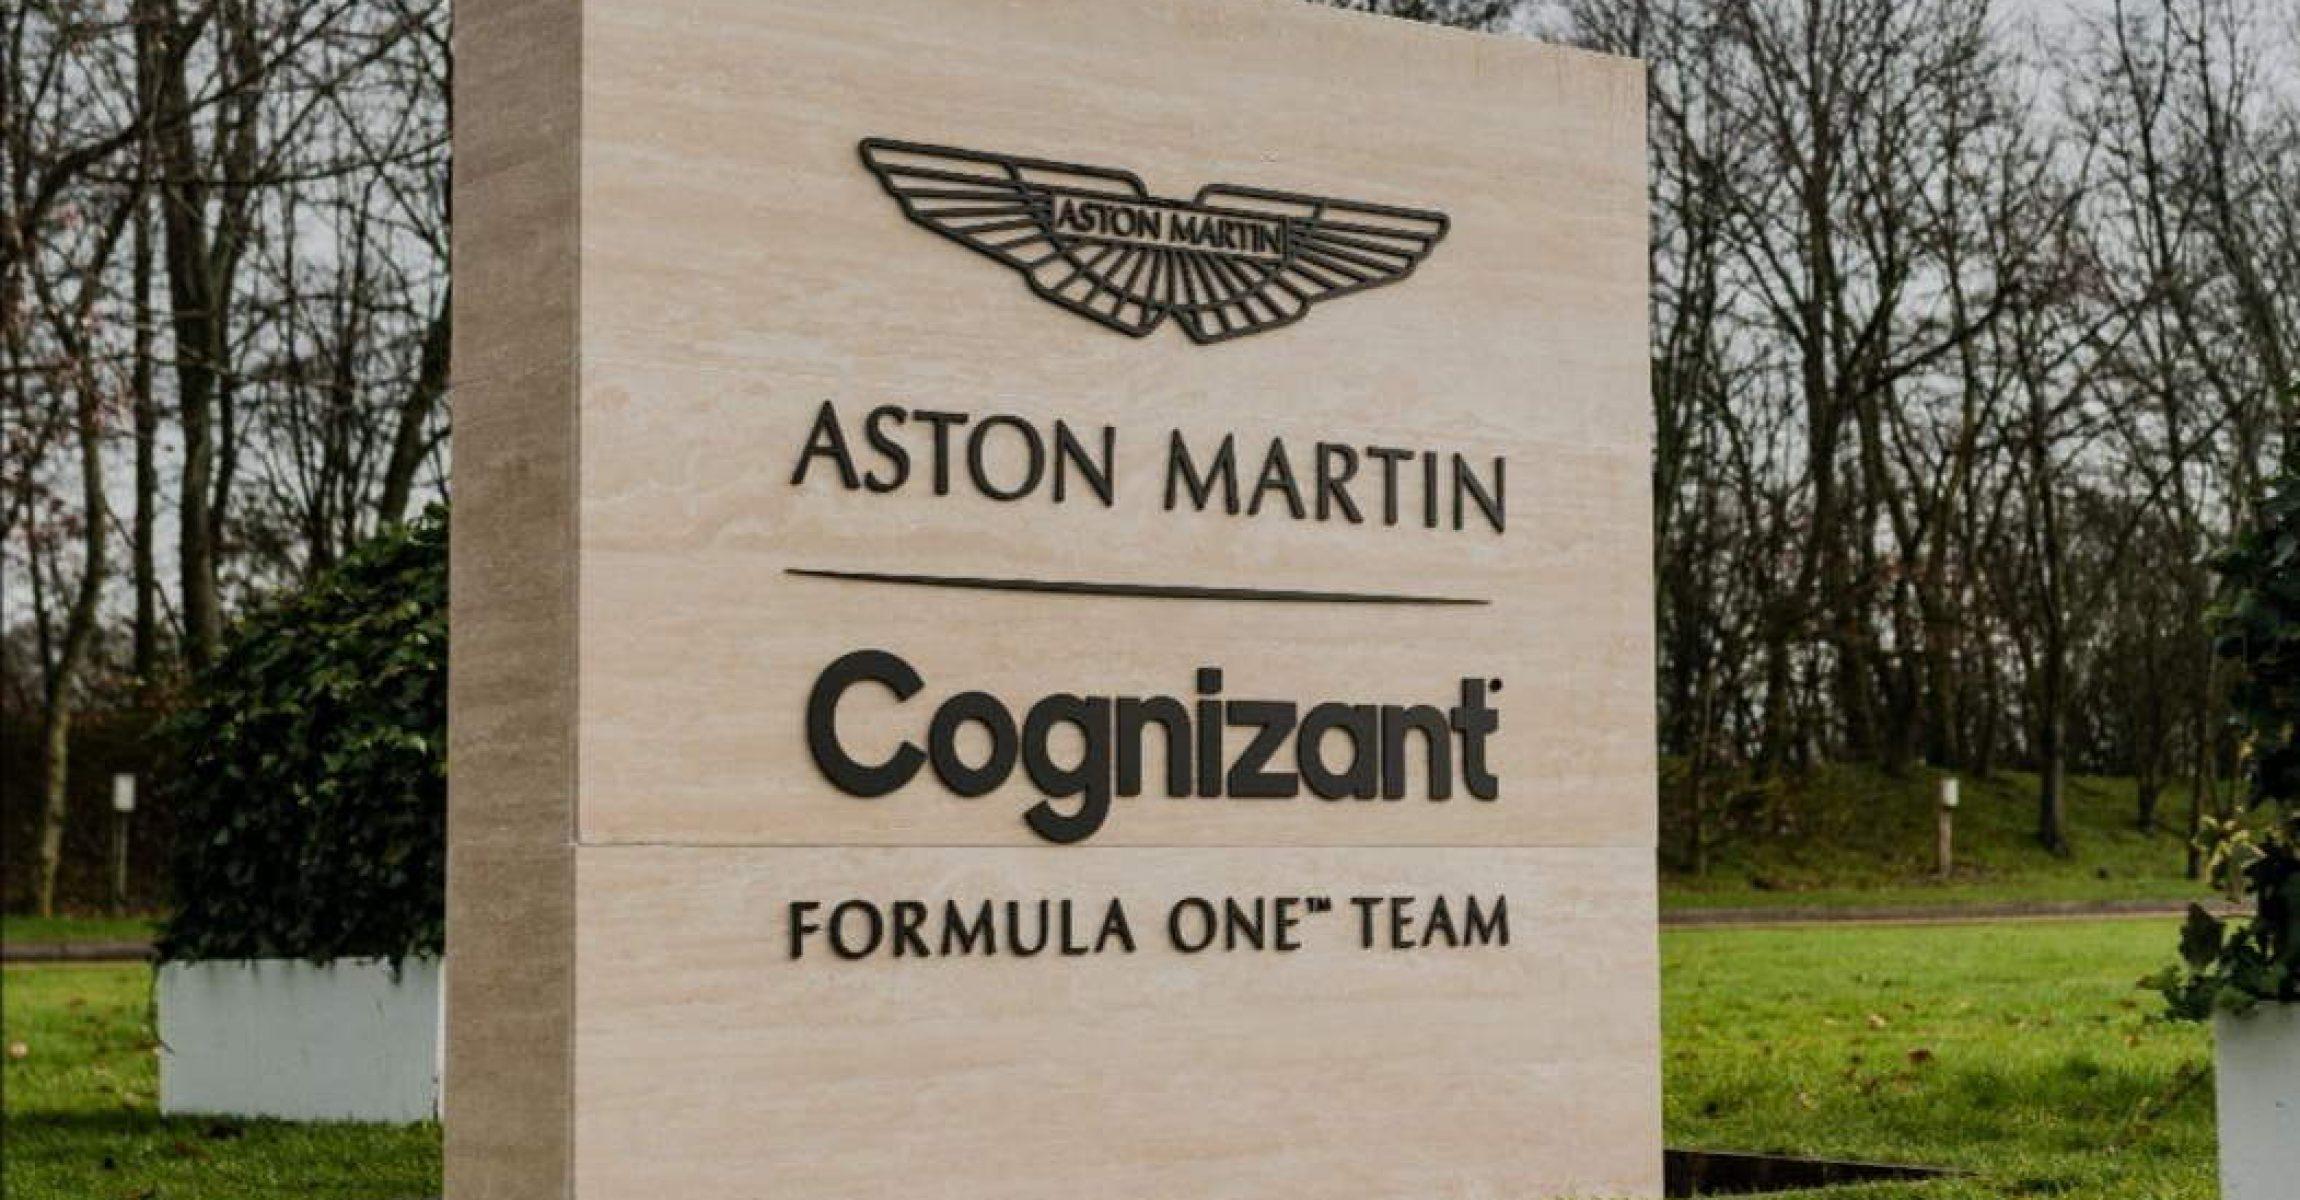 Cognizant Aston Martin Formula One Team